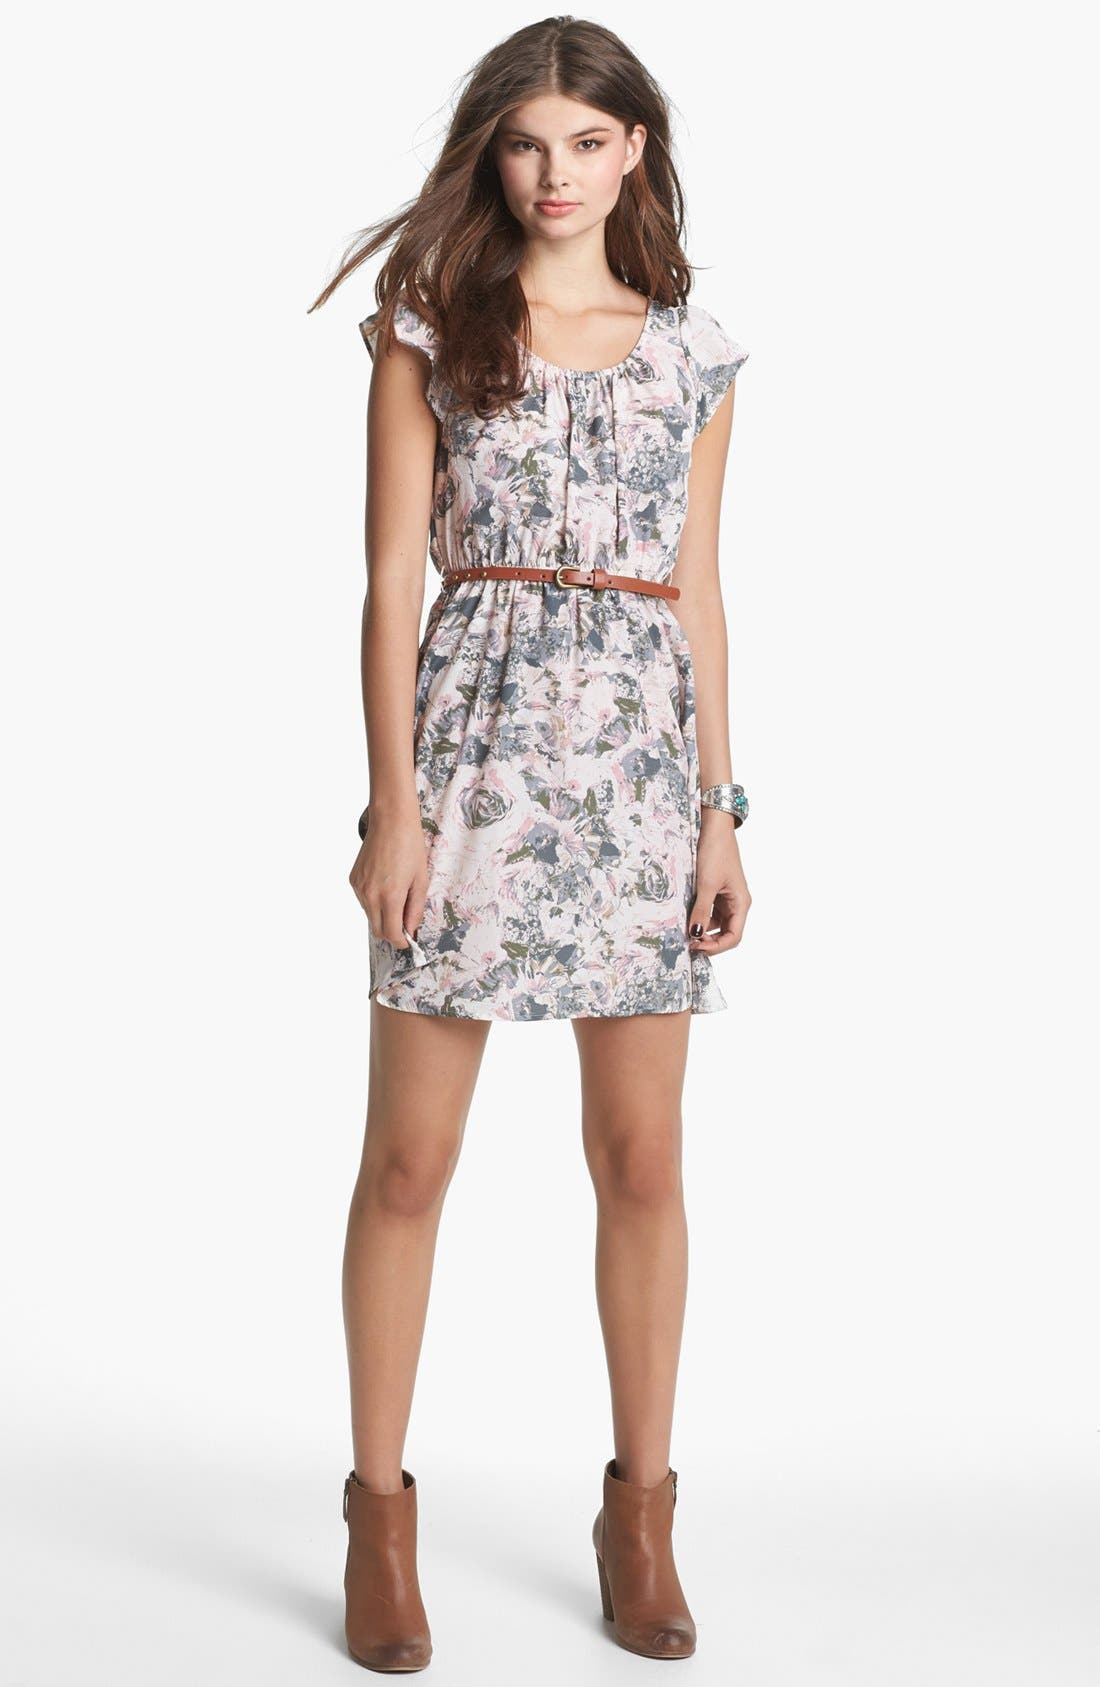 Alternate Image 1 Selected - Socialite Cage Back Floral Print Dress (Juniors) (Online Only)